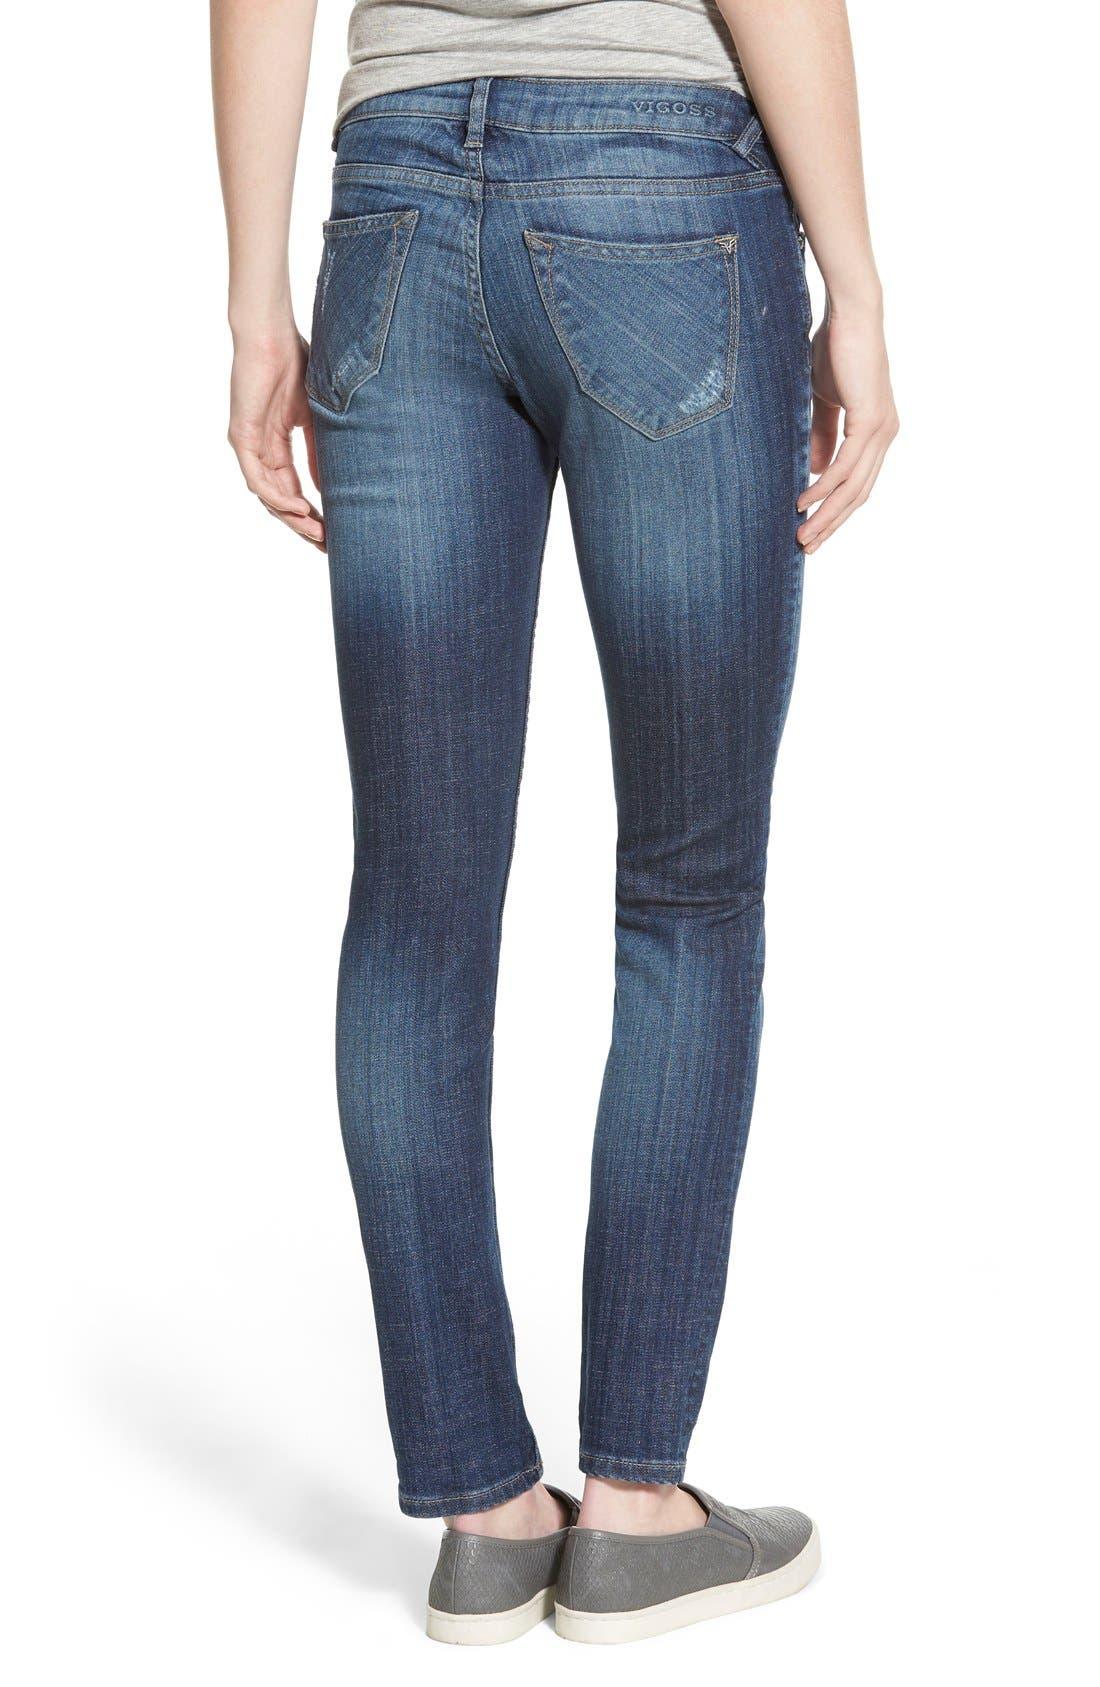 Alternate Image 3  - Vigoss 'Tomboy' Destroyed Skinny Jeans